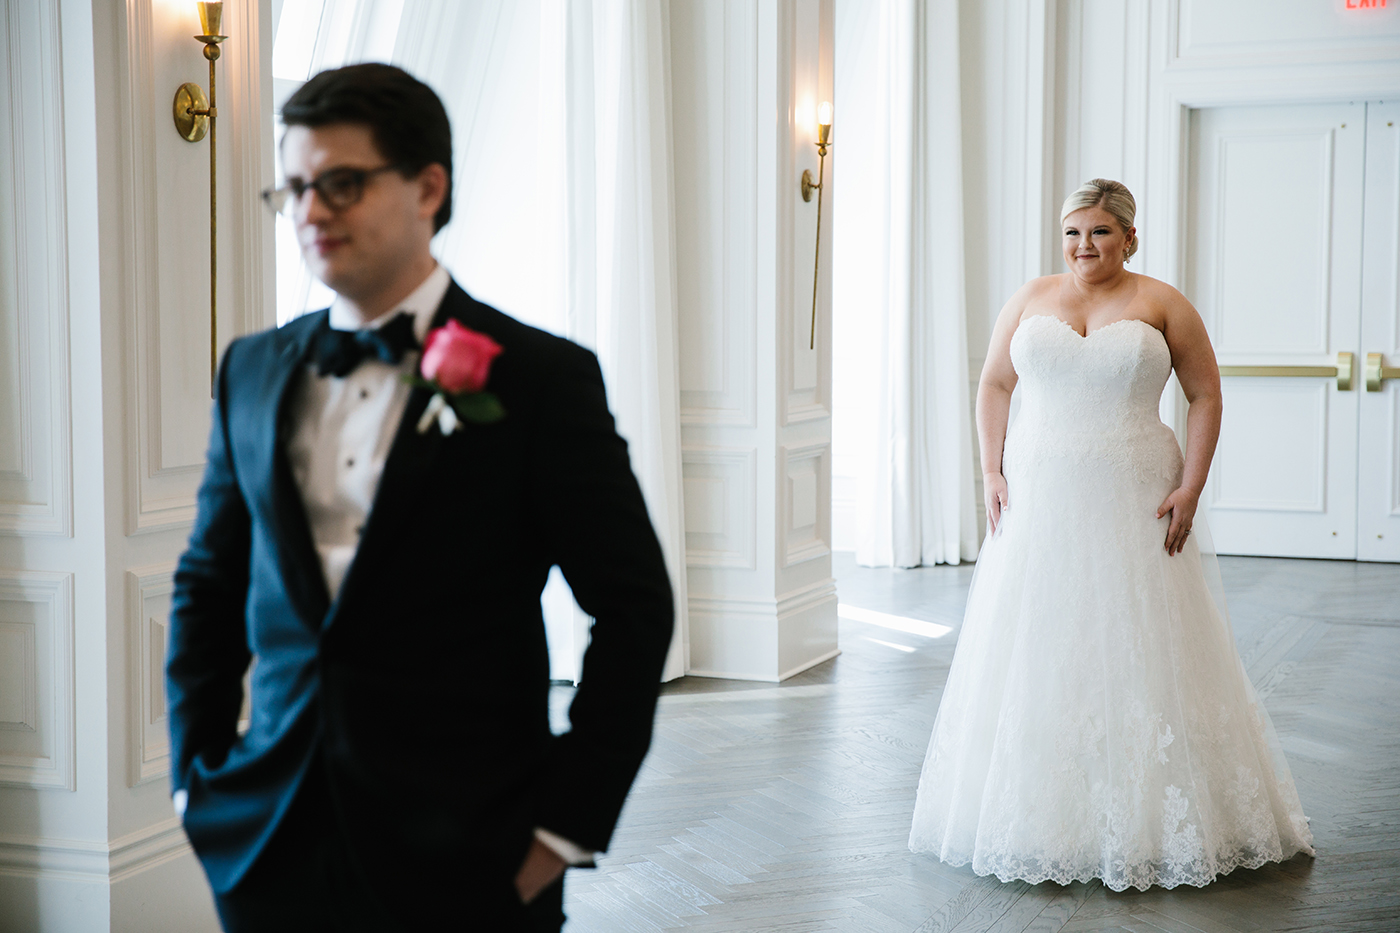 Dallas Weddings Planner - Allday Events - Katie + Matthew at The Adolphus Hotel - 151.jpg